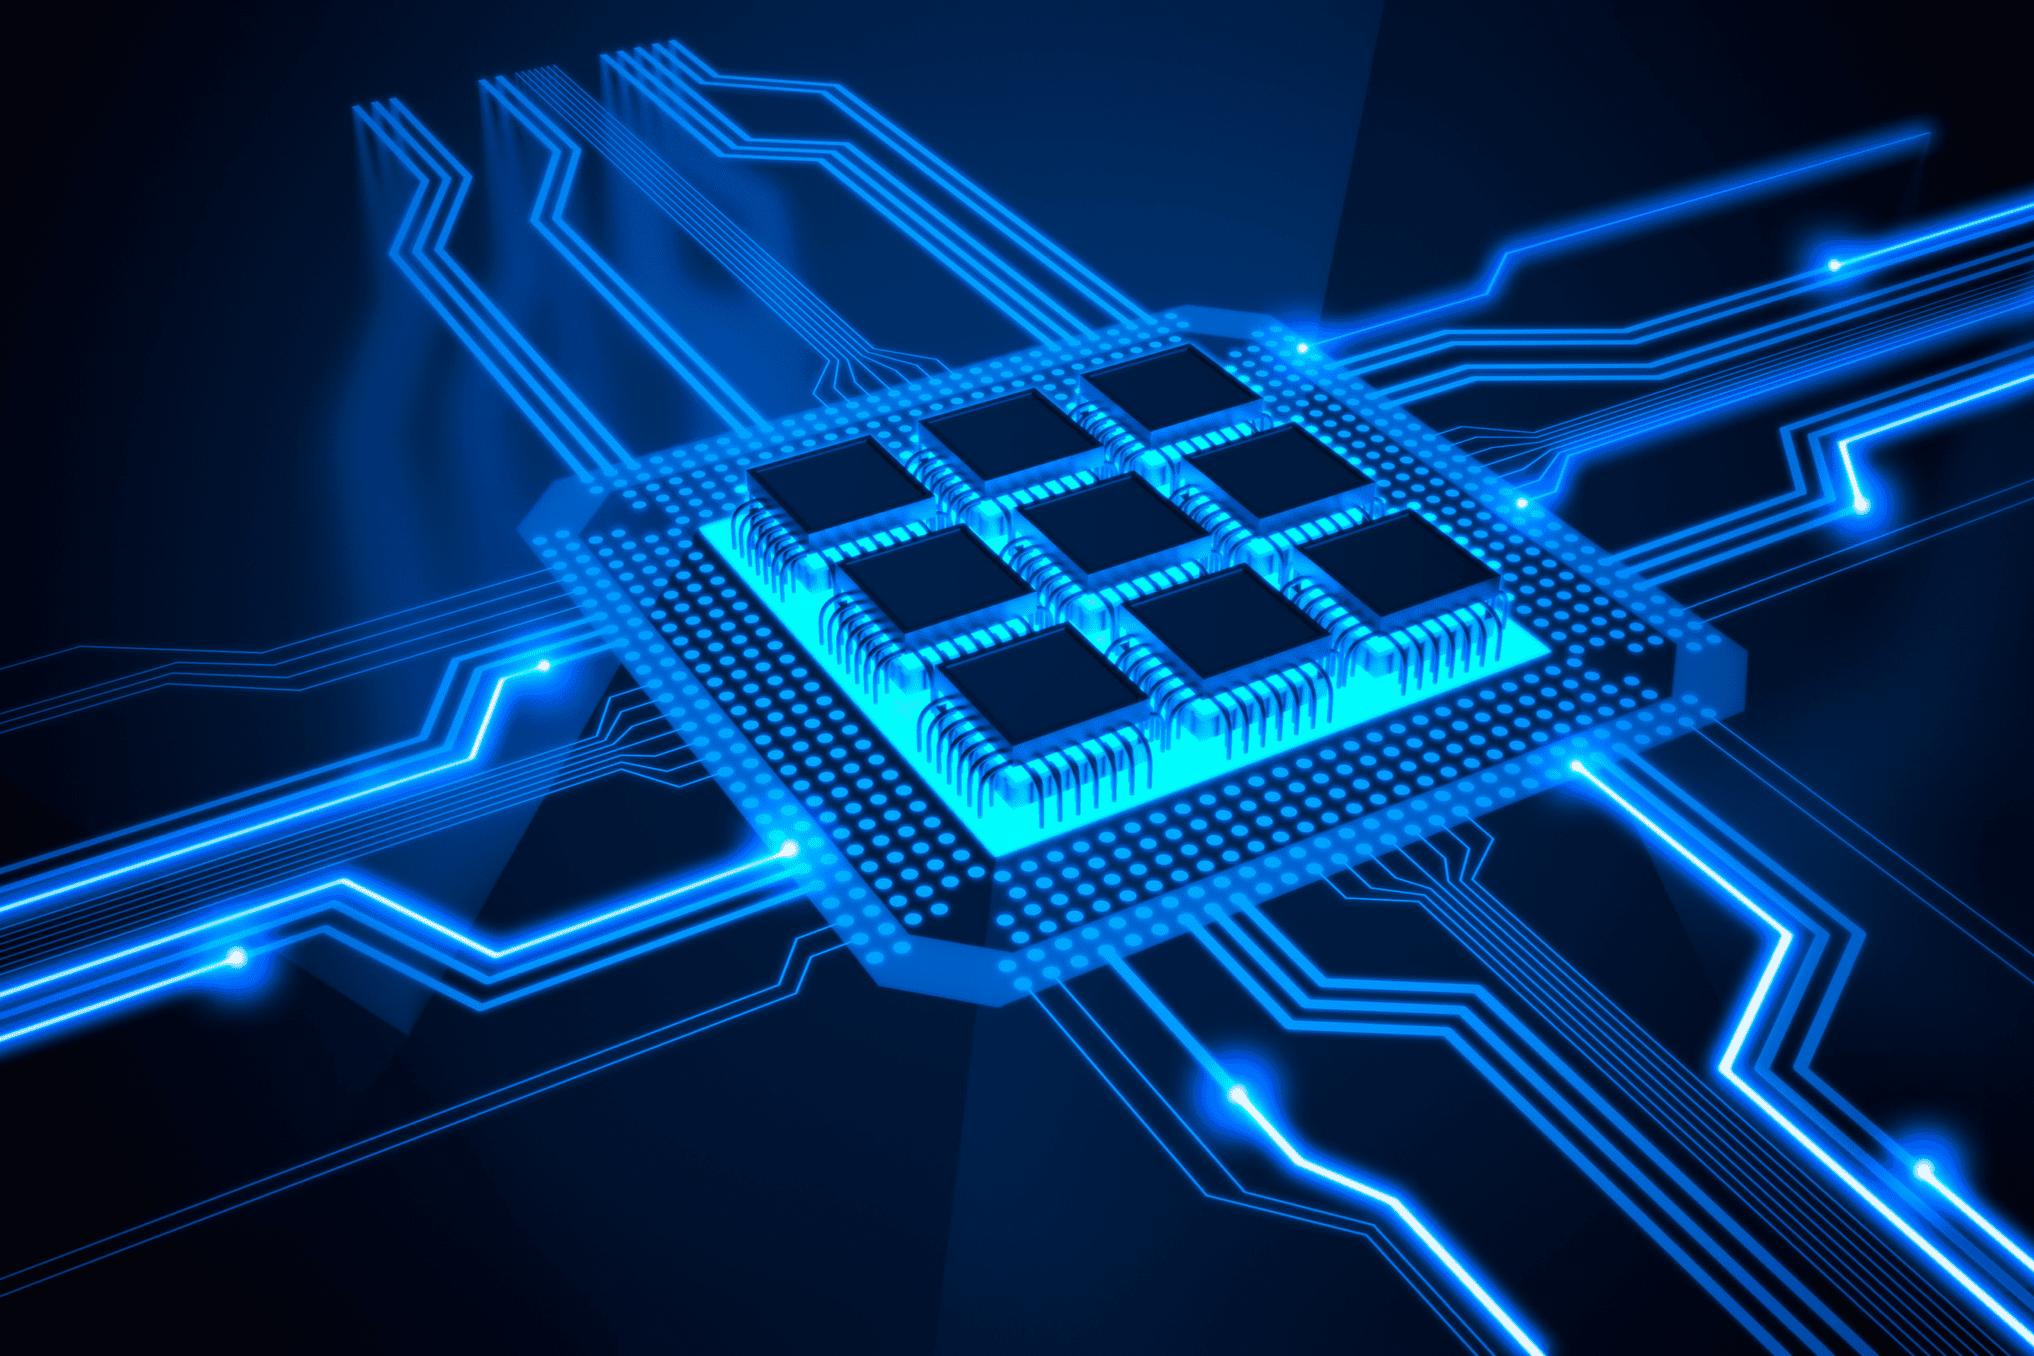 Blue microchip illustration